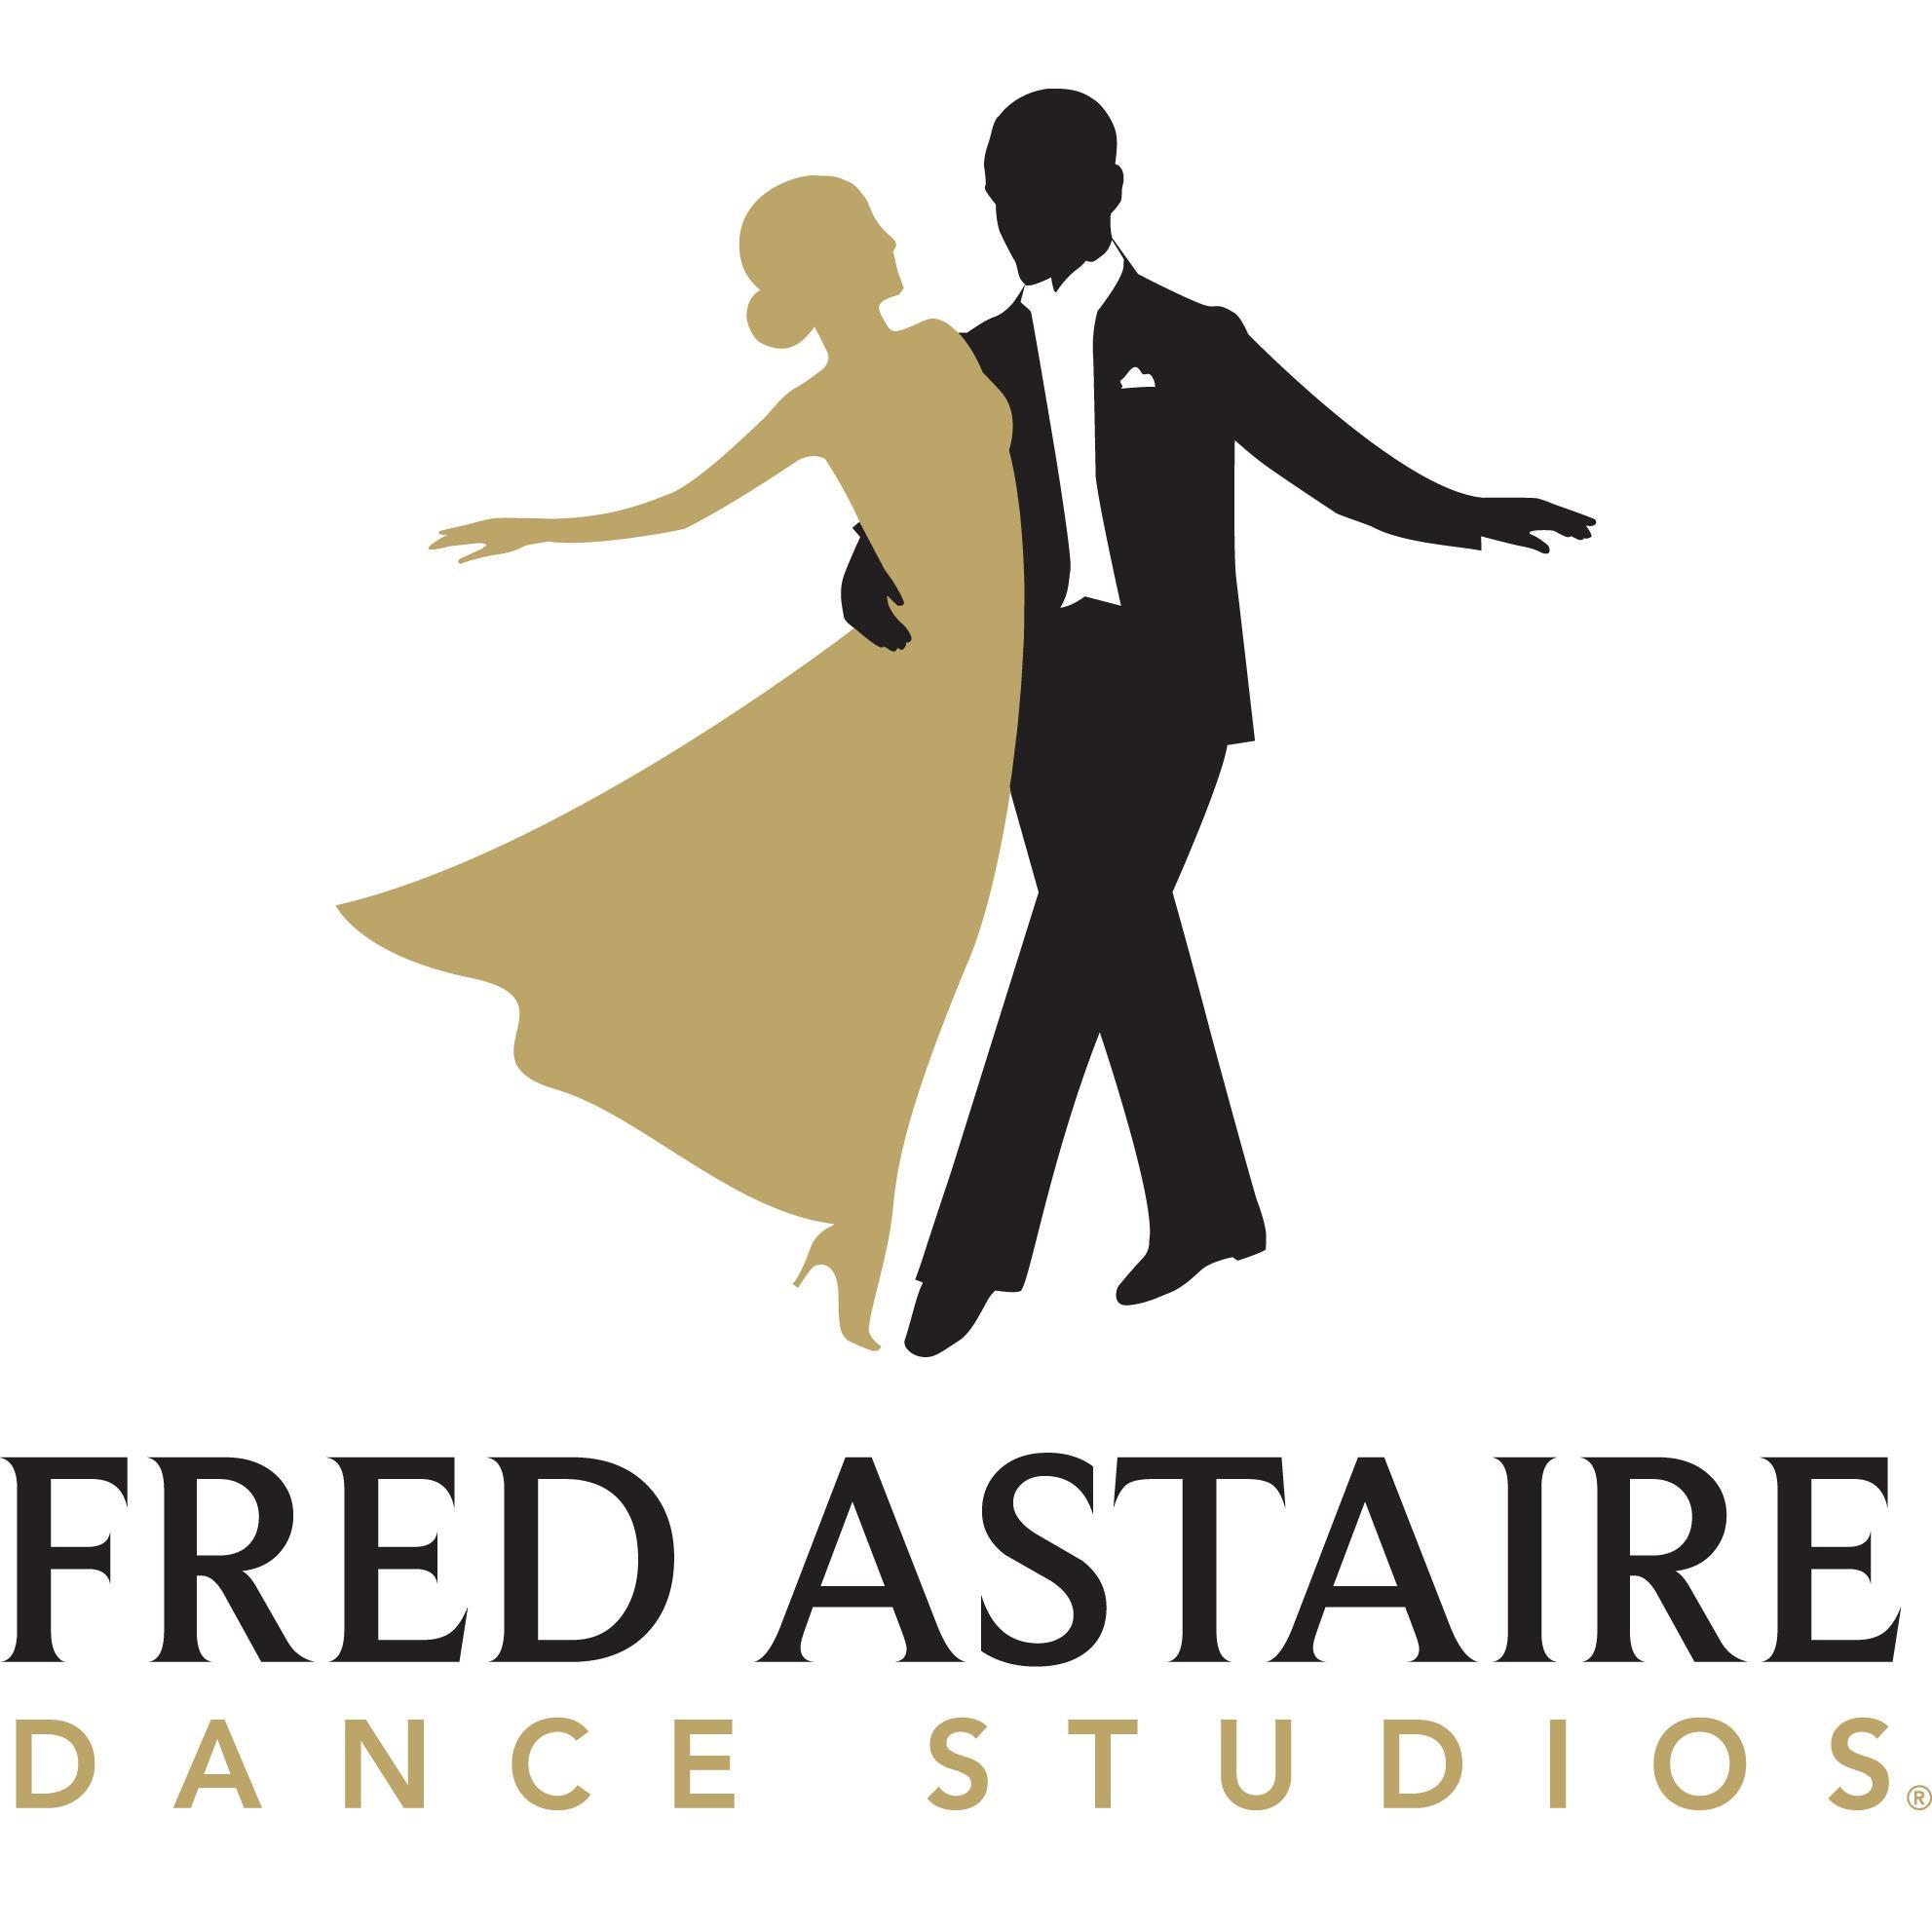 Fred Astaire Dance Studios - Warwick, RI